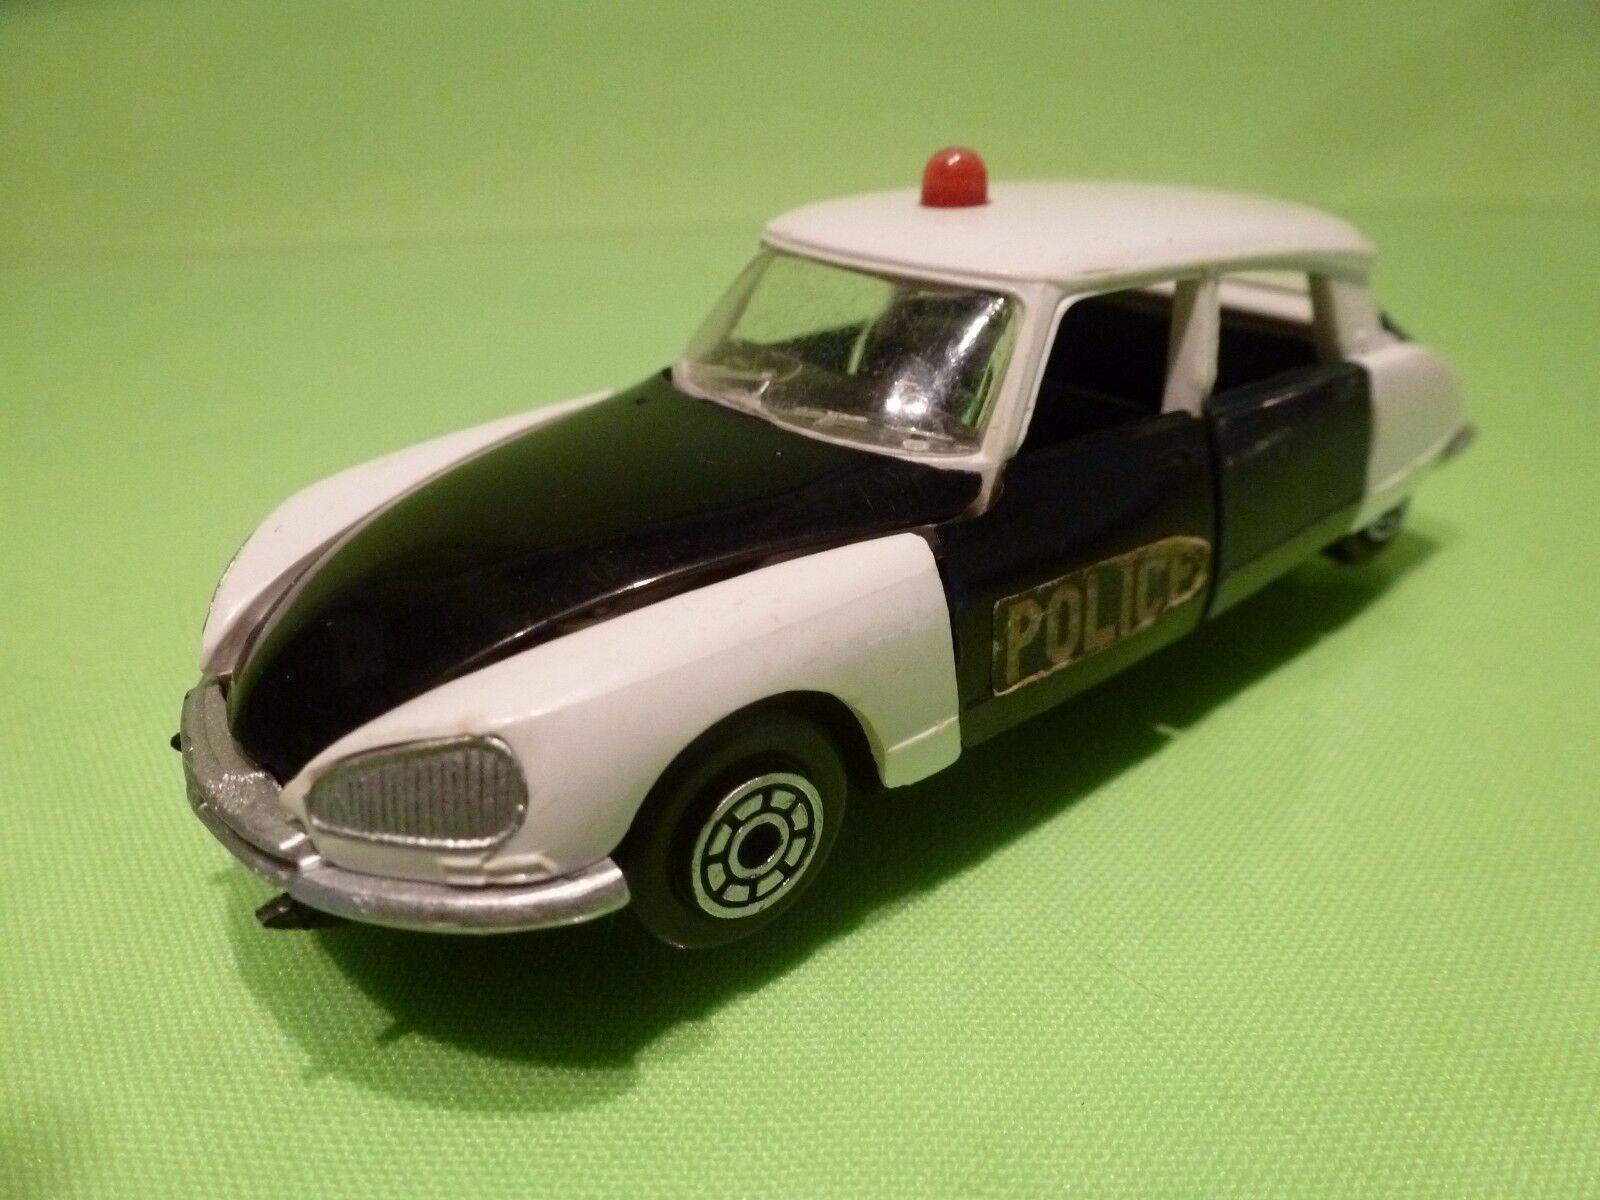 NOREV PLASTIK 158  DS 21 - POLICE - DARK BLUE + WHITE 1:43 - GOOD CONDITION